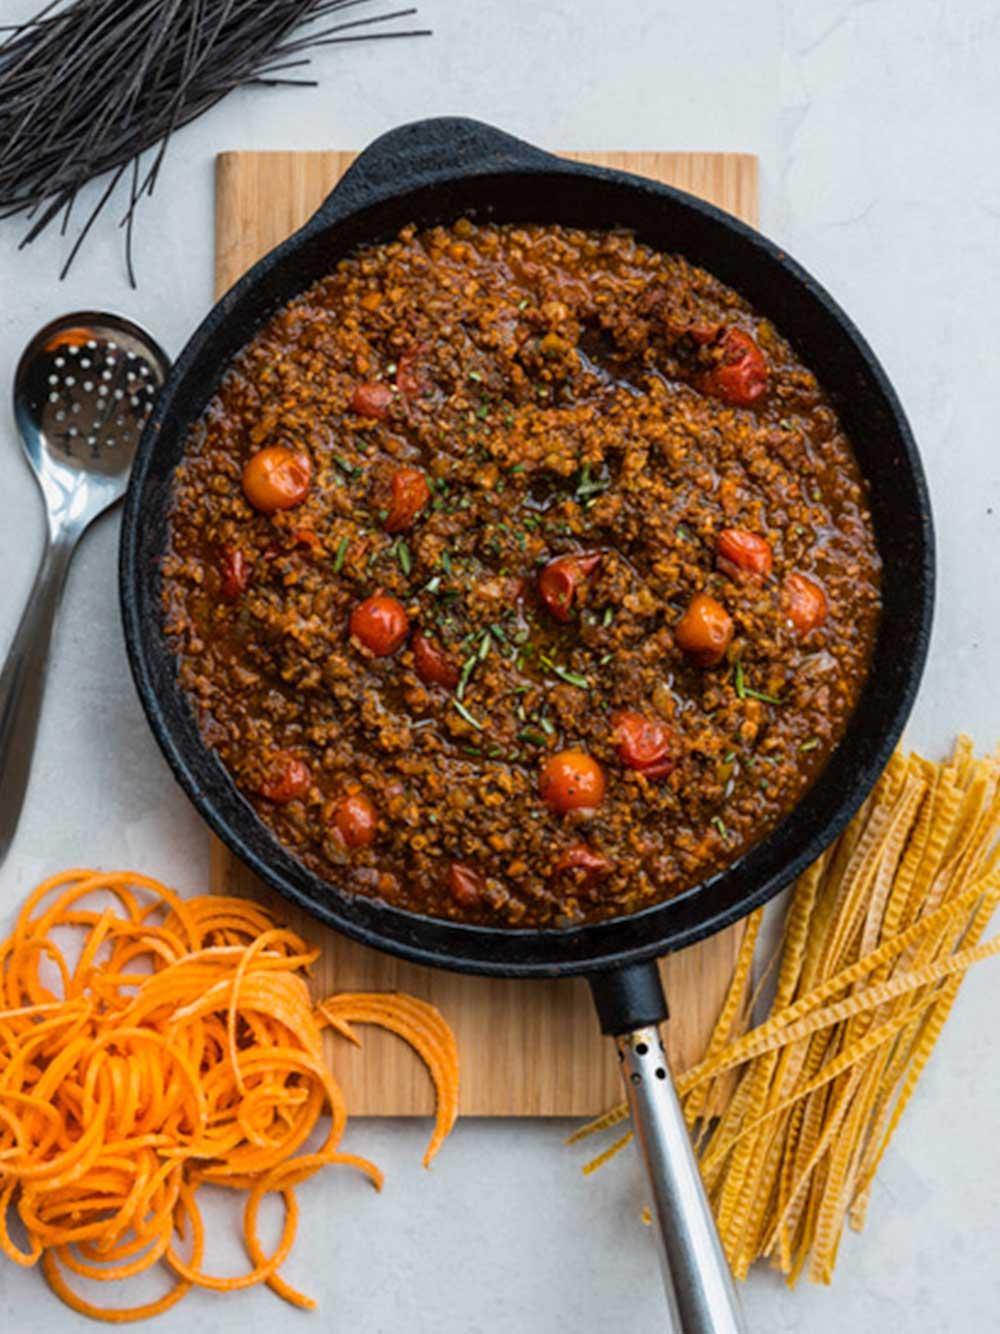 Spaghetti bolognese vego style